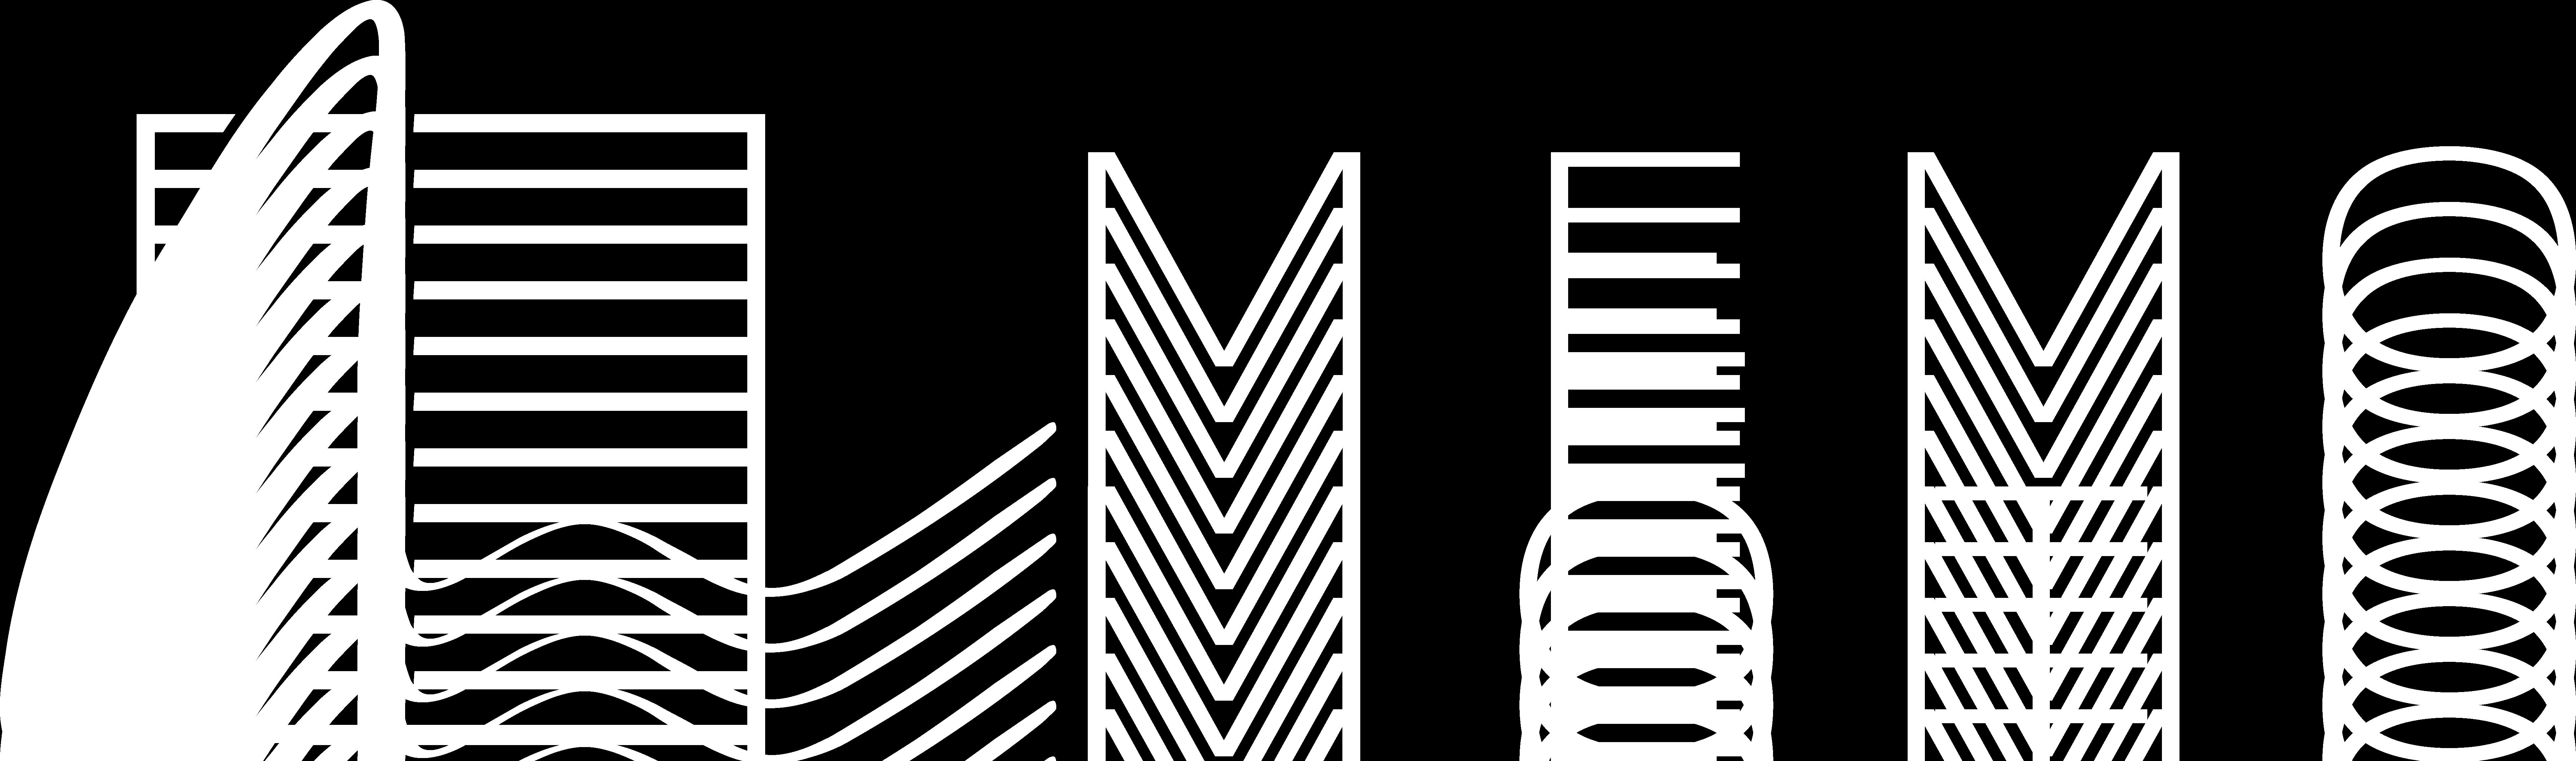 Altenpflege 2017 - Nürnberg - MemoMoto